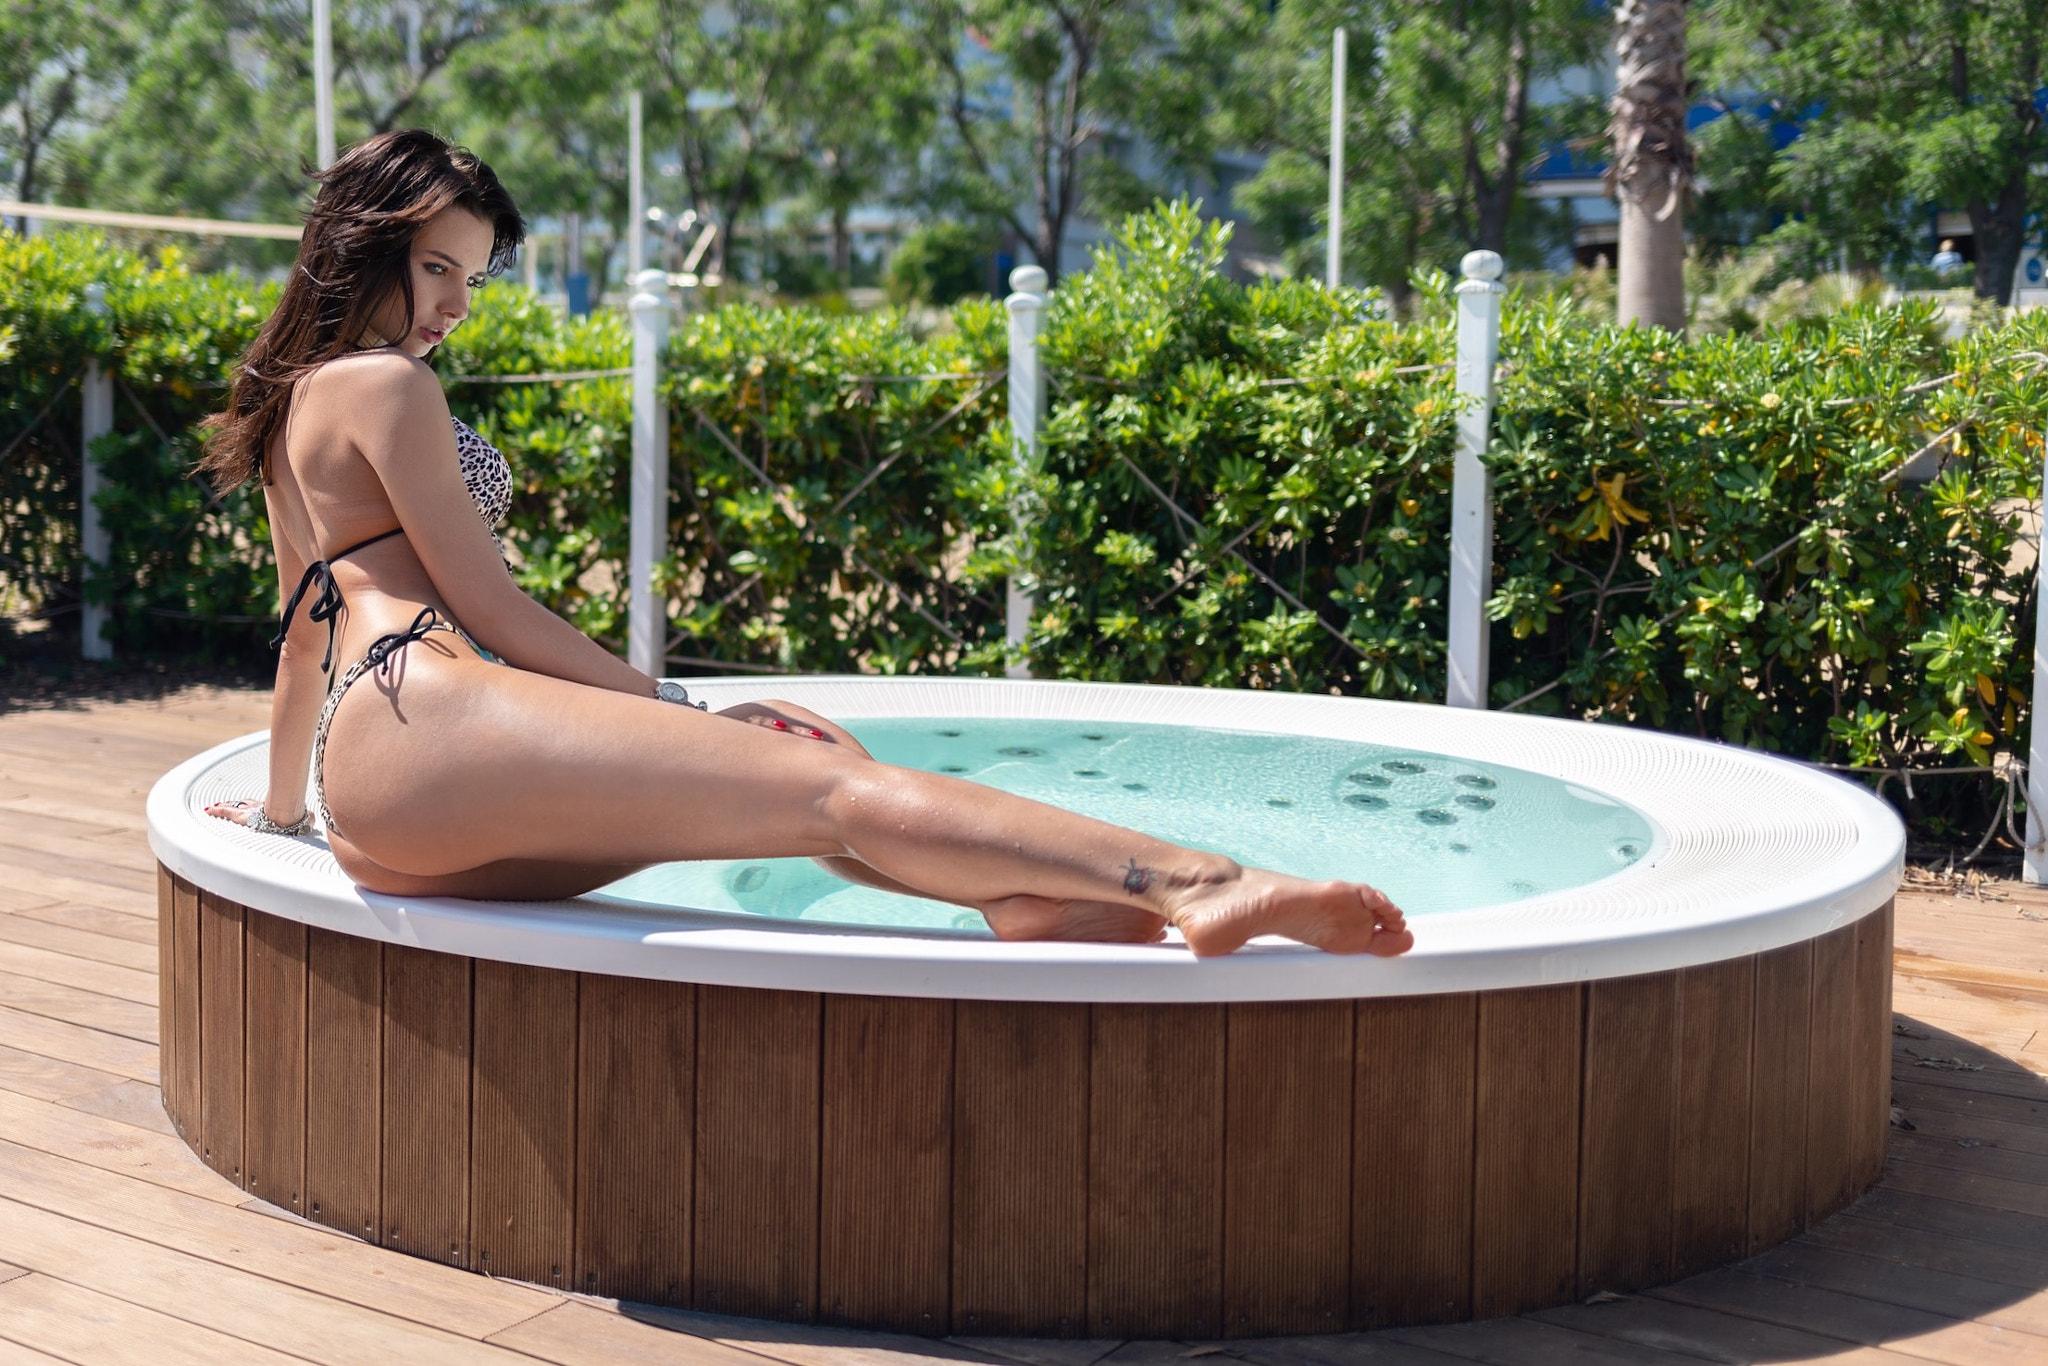 Girls hits hot tub